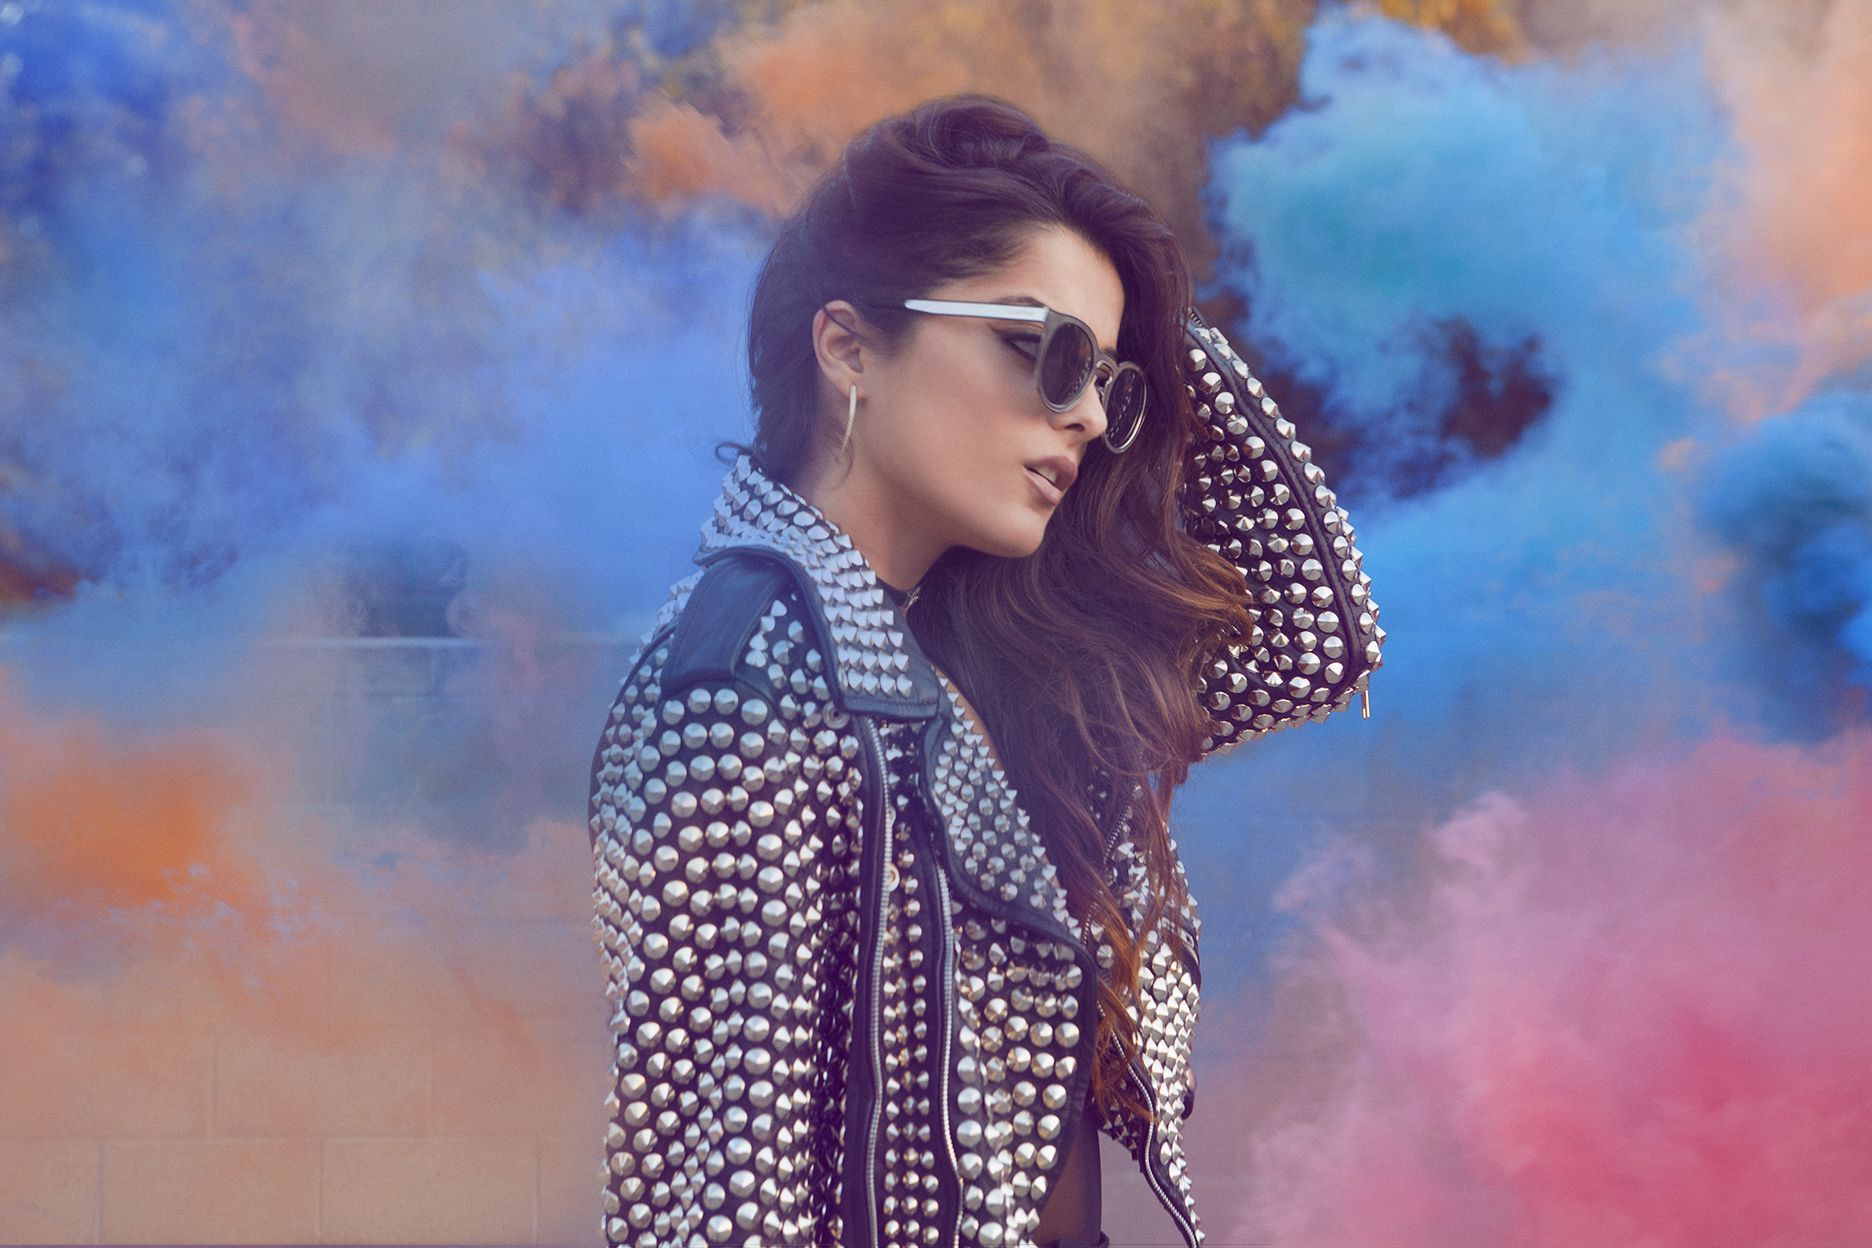 Bebe Rexha Wallpapers Hd Collection For Free Download Bebe Rexha Bebe Bebe Rexa